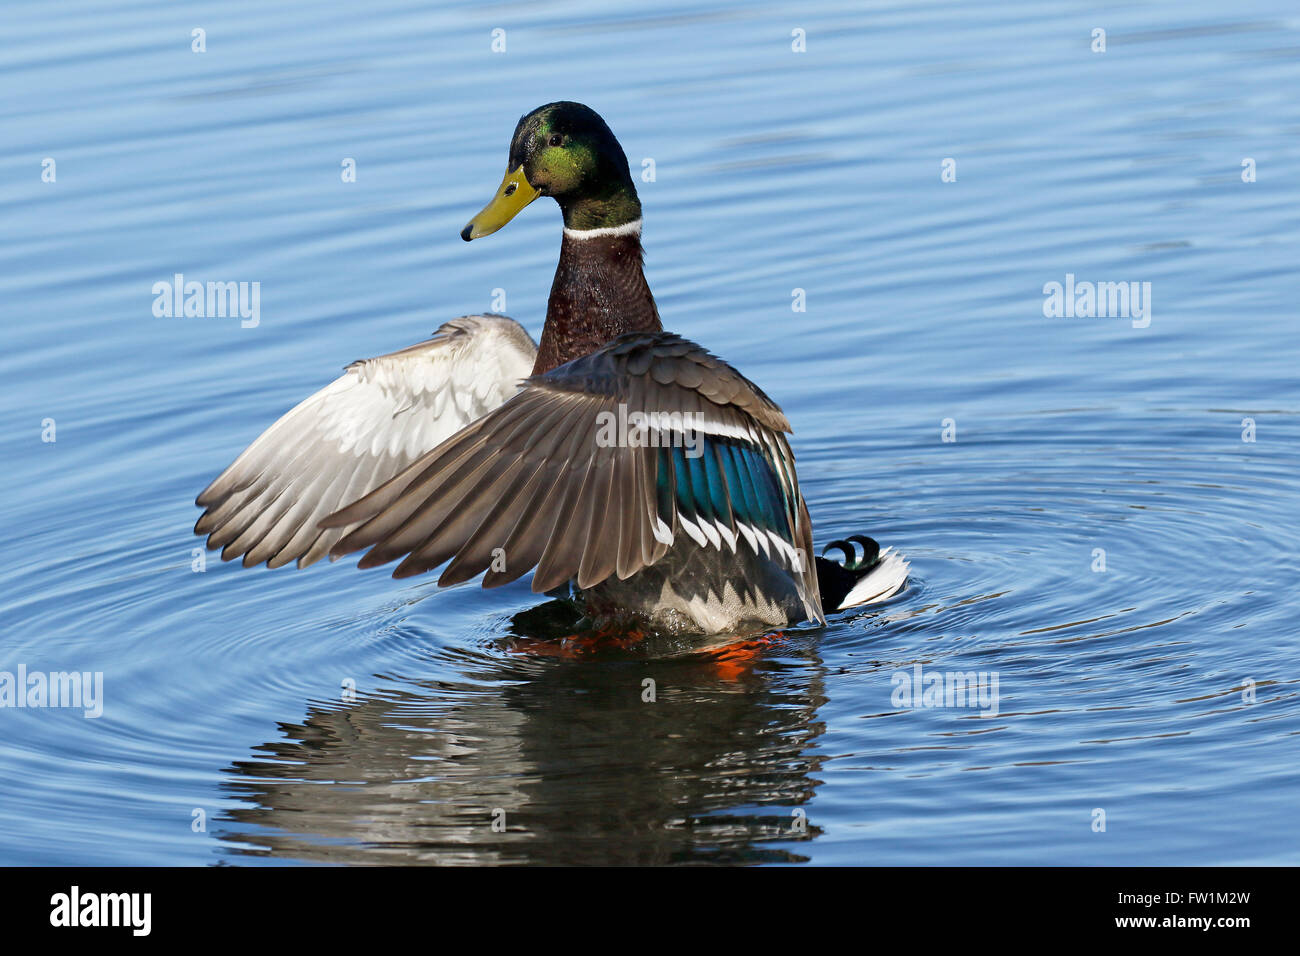 Mallard (Anas platyrhynchos), drake flapping his wings in the water, Switzerland - Stock Image